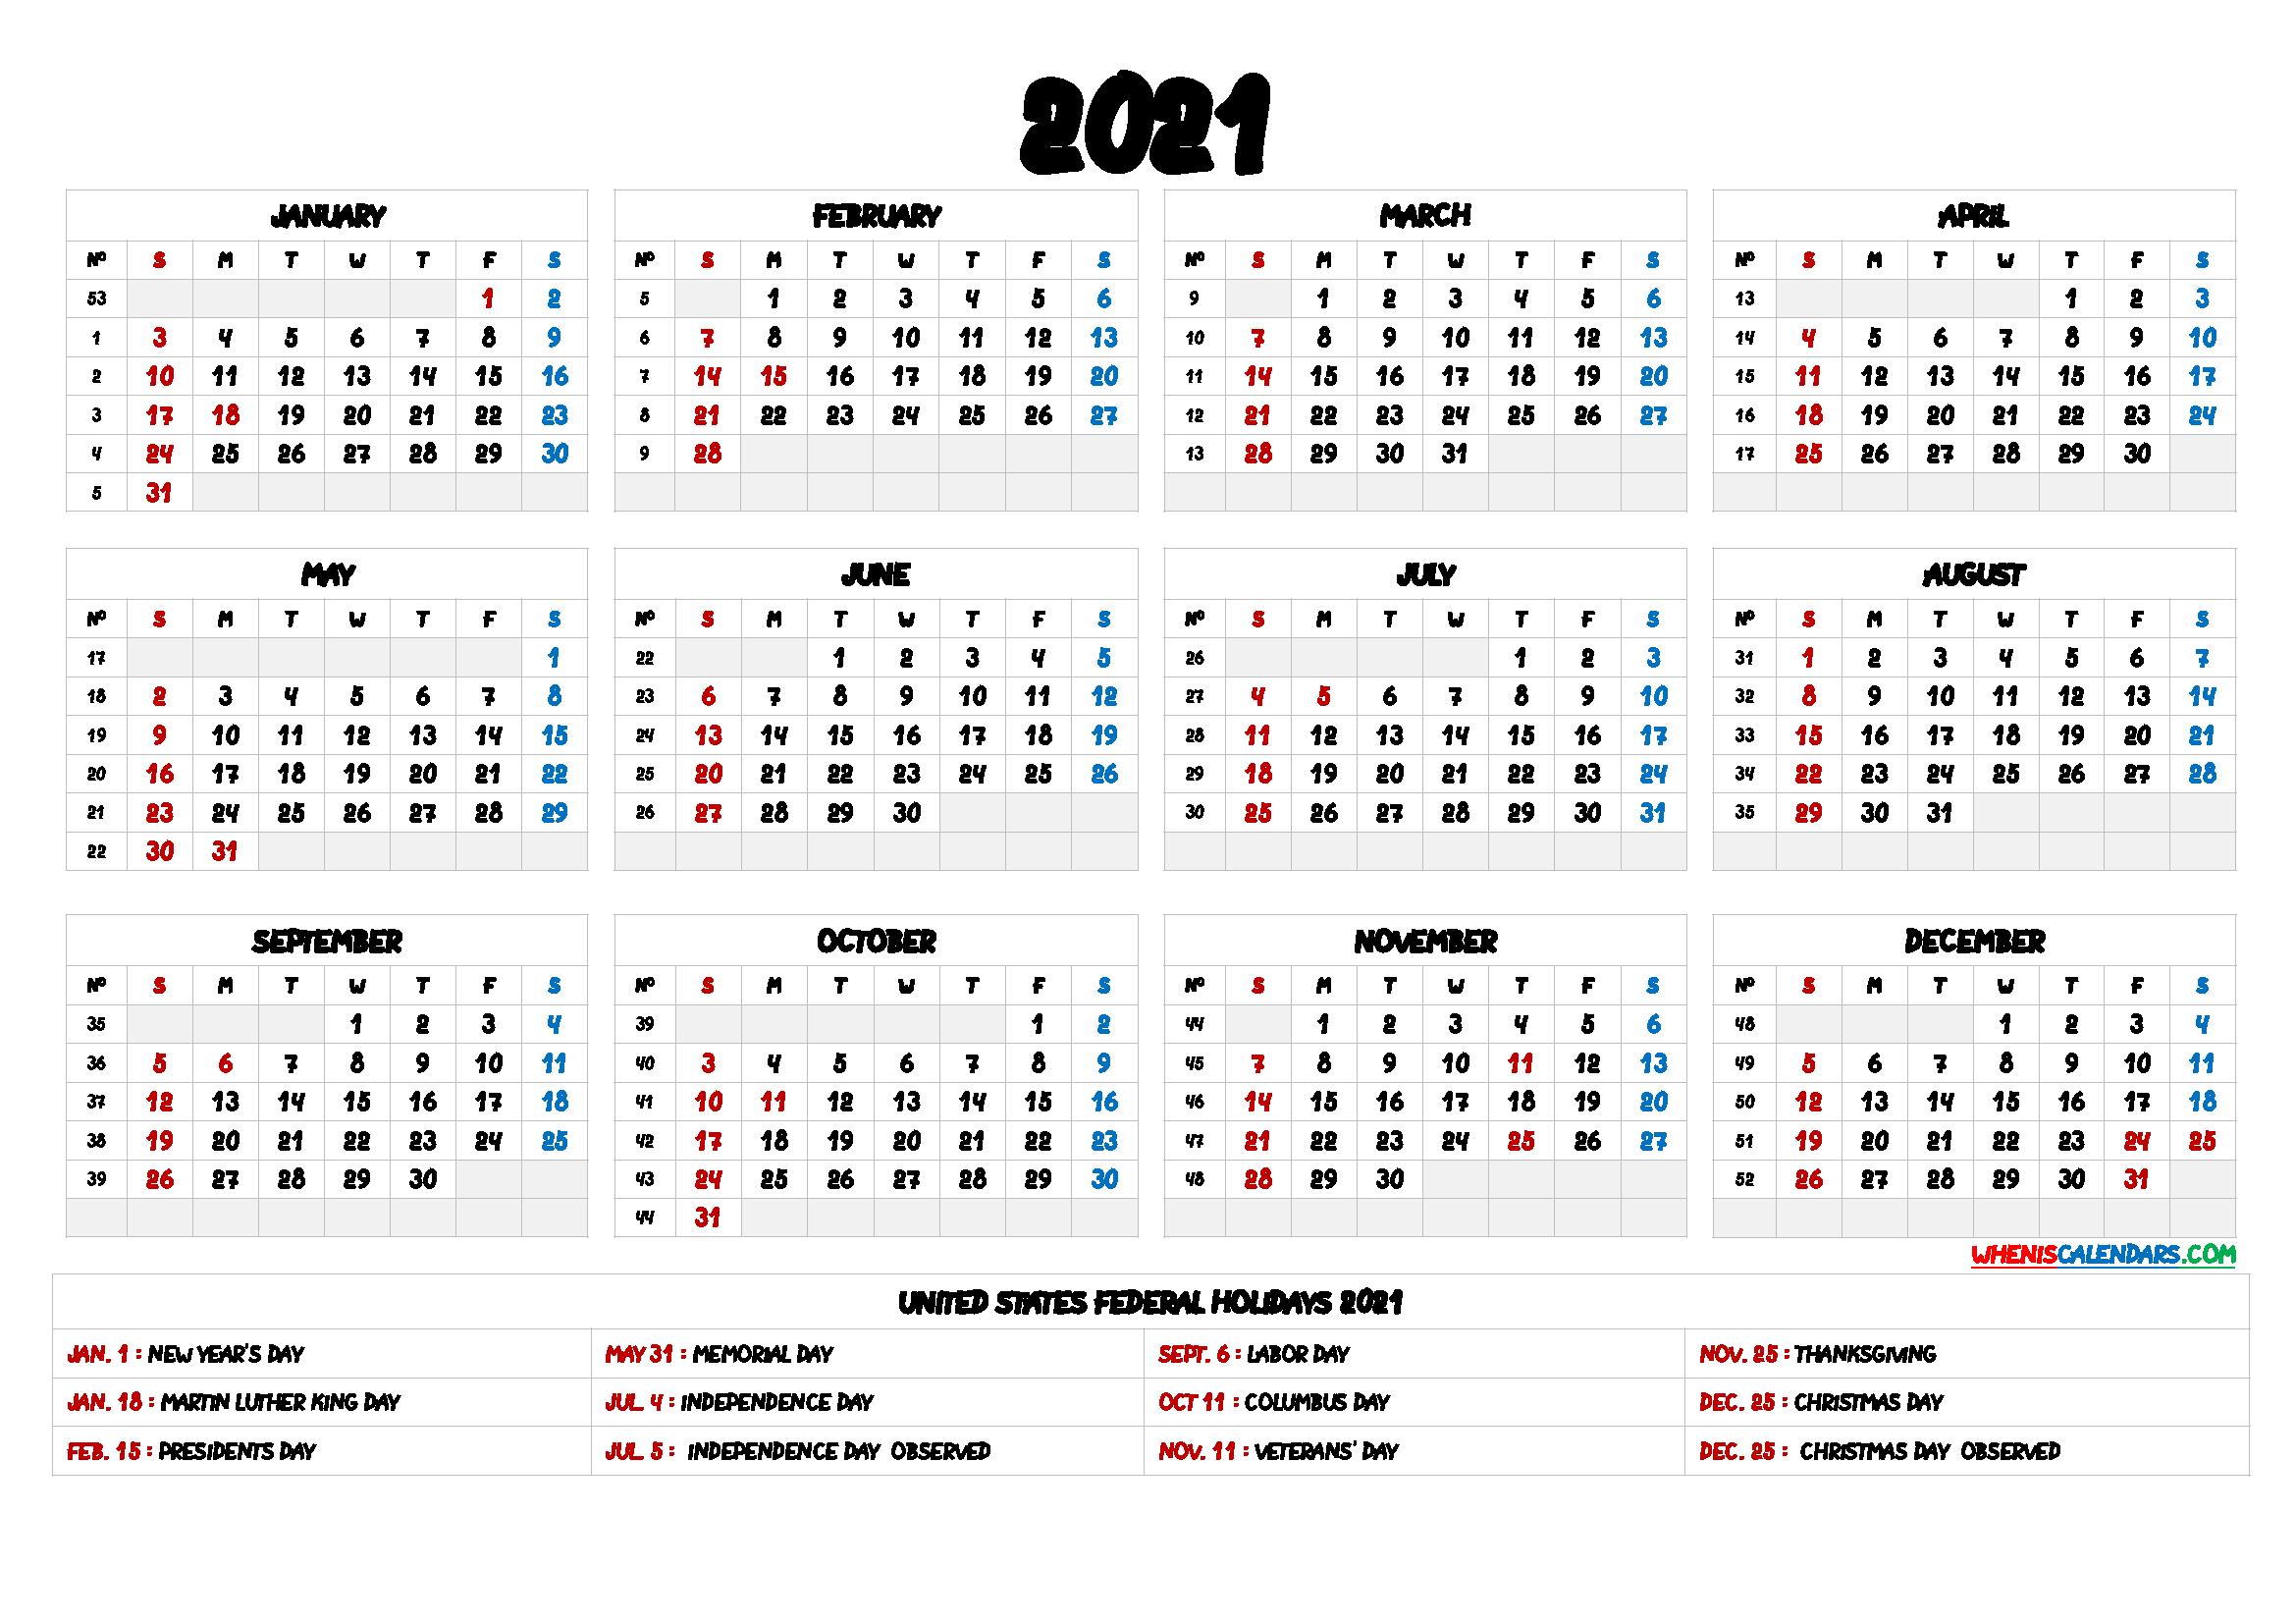 2021 One Page Calendar Printable - 9 Templates